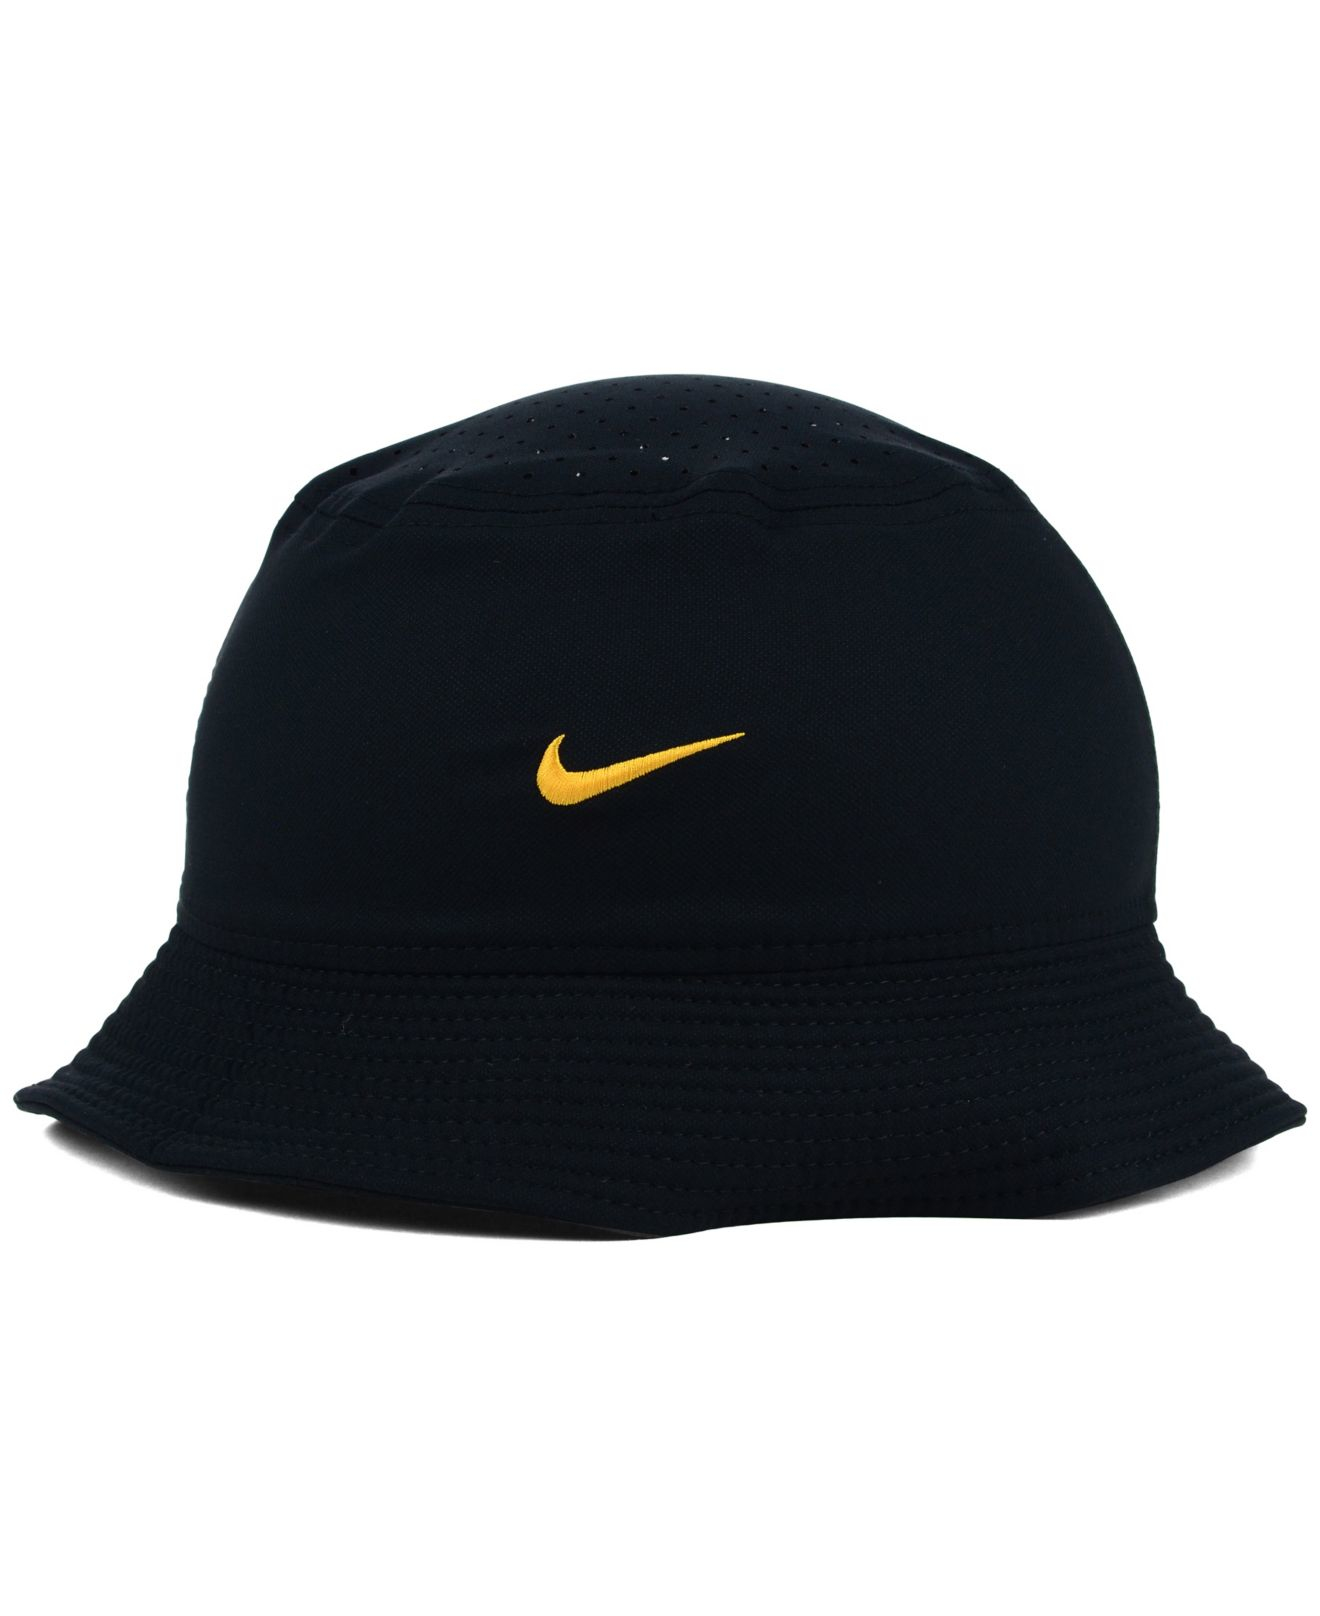 c5da389dec3 ... denmark lyst nike iowa hawkeyes vapor bucket hat in black for men bf4d1  d1490